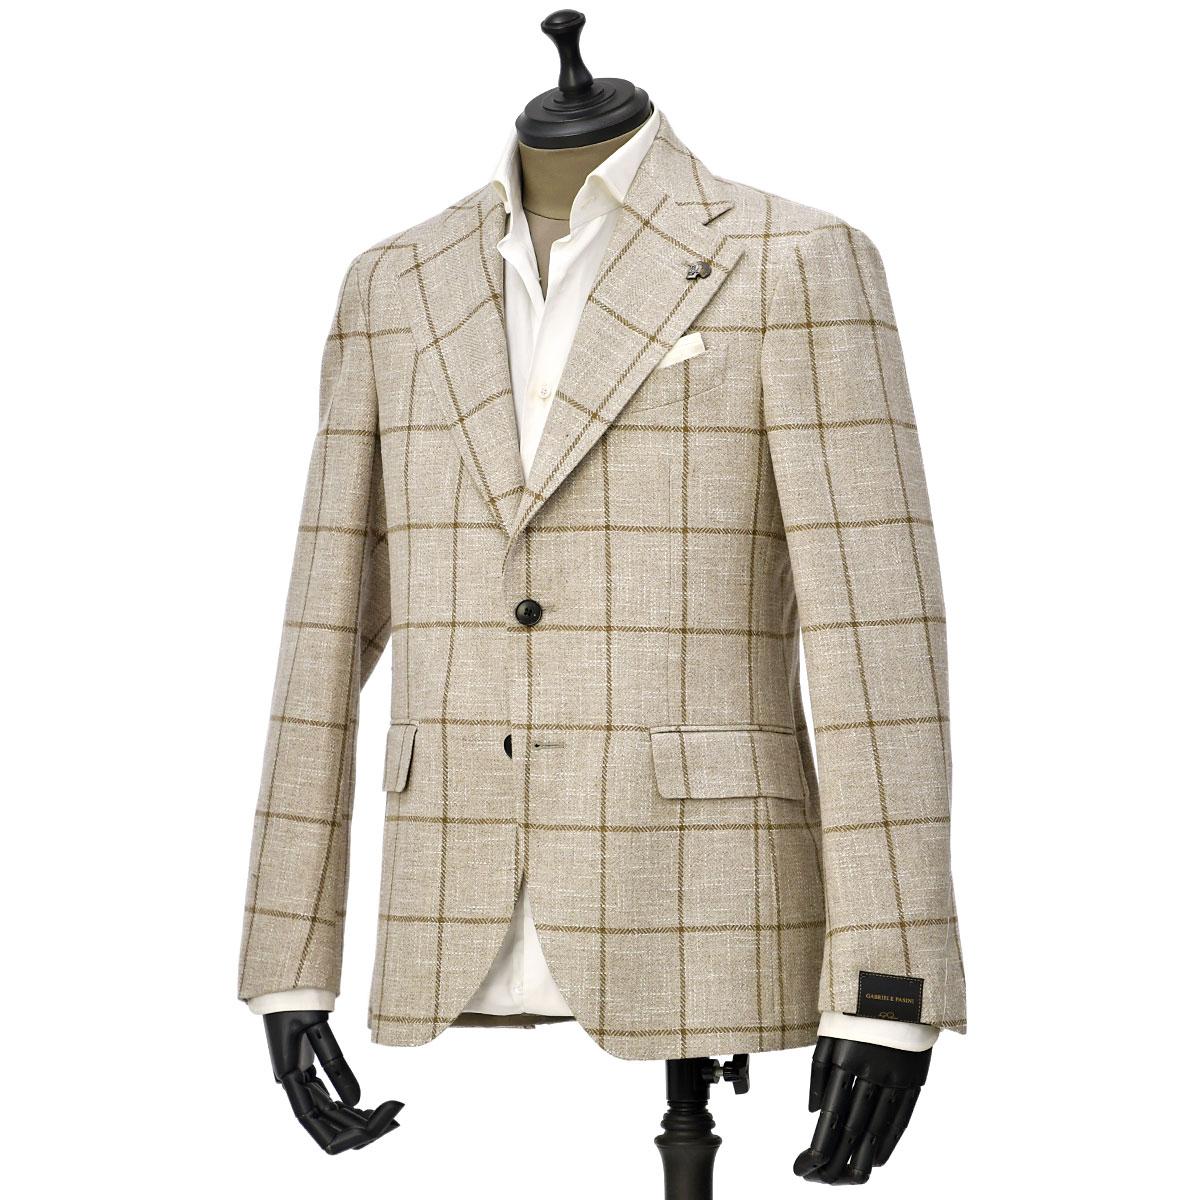 Gabriele Pasini【ガブリエレ パジーニ】シングルジャケット JG16074Q GP161475 3 ウール コットン リネン ウィンドペーン ベージュ